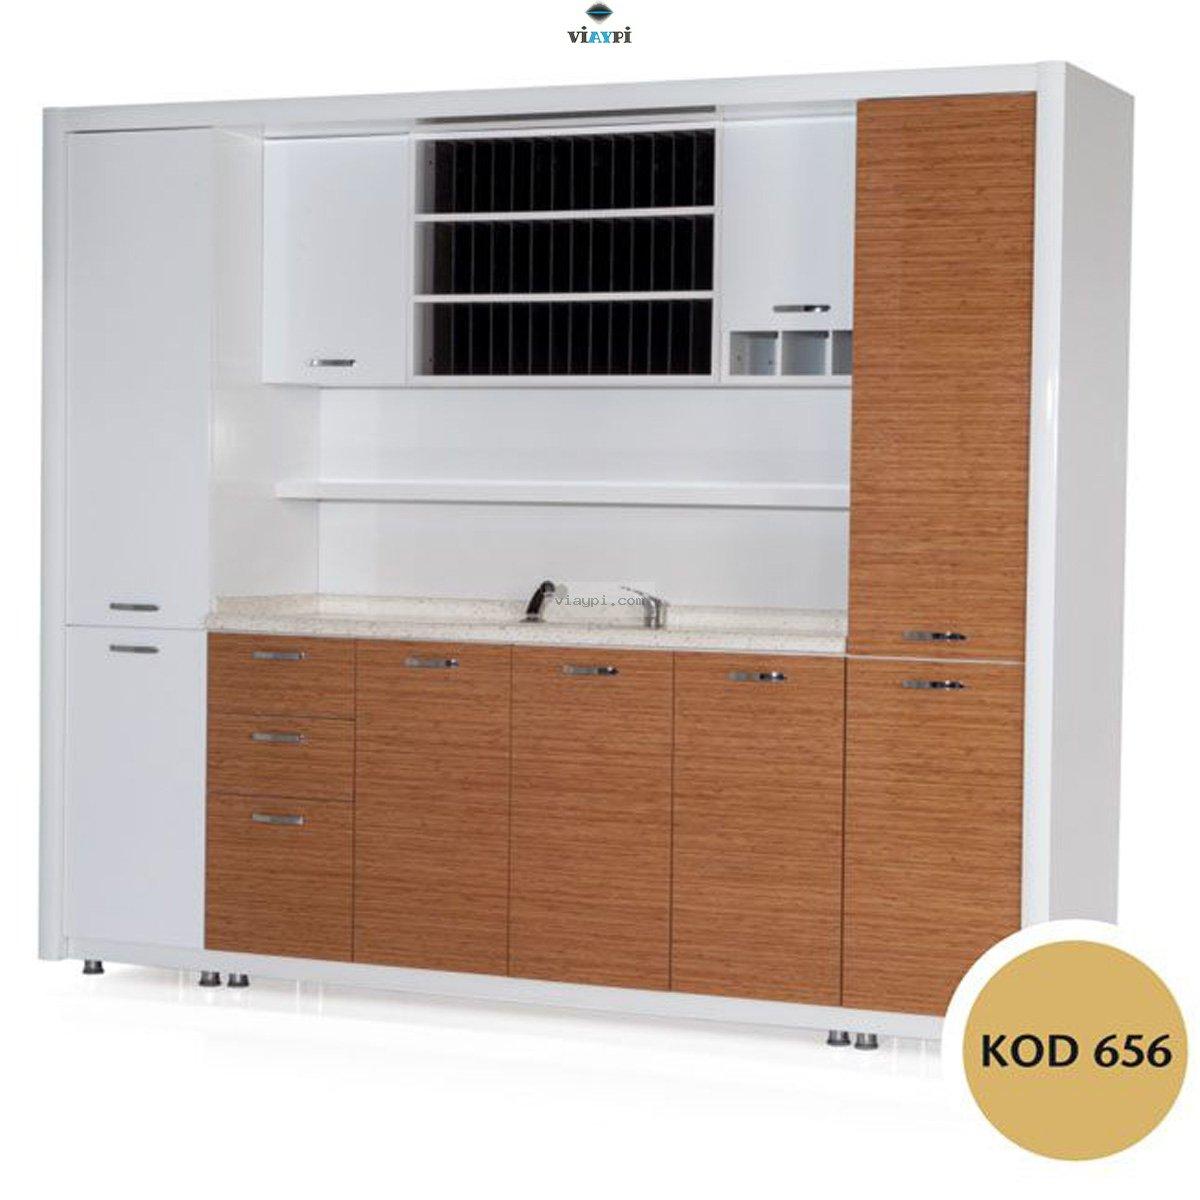 Laboratory Vyp-r2